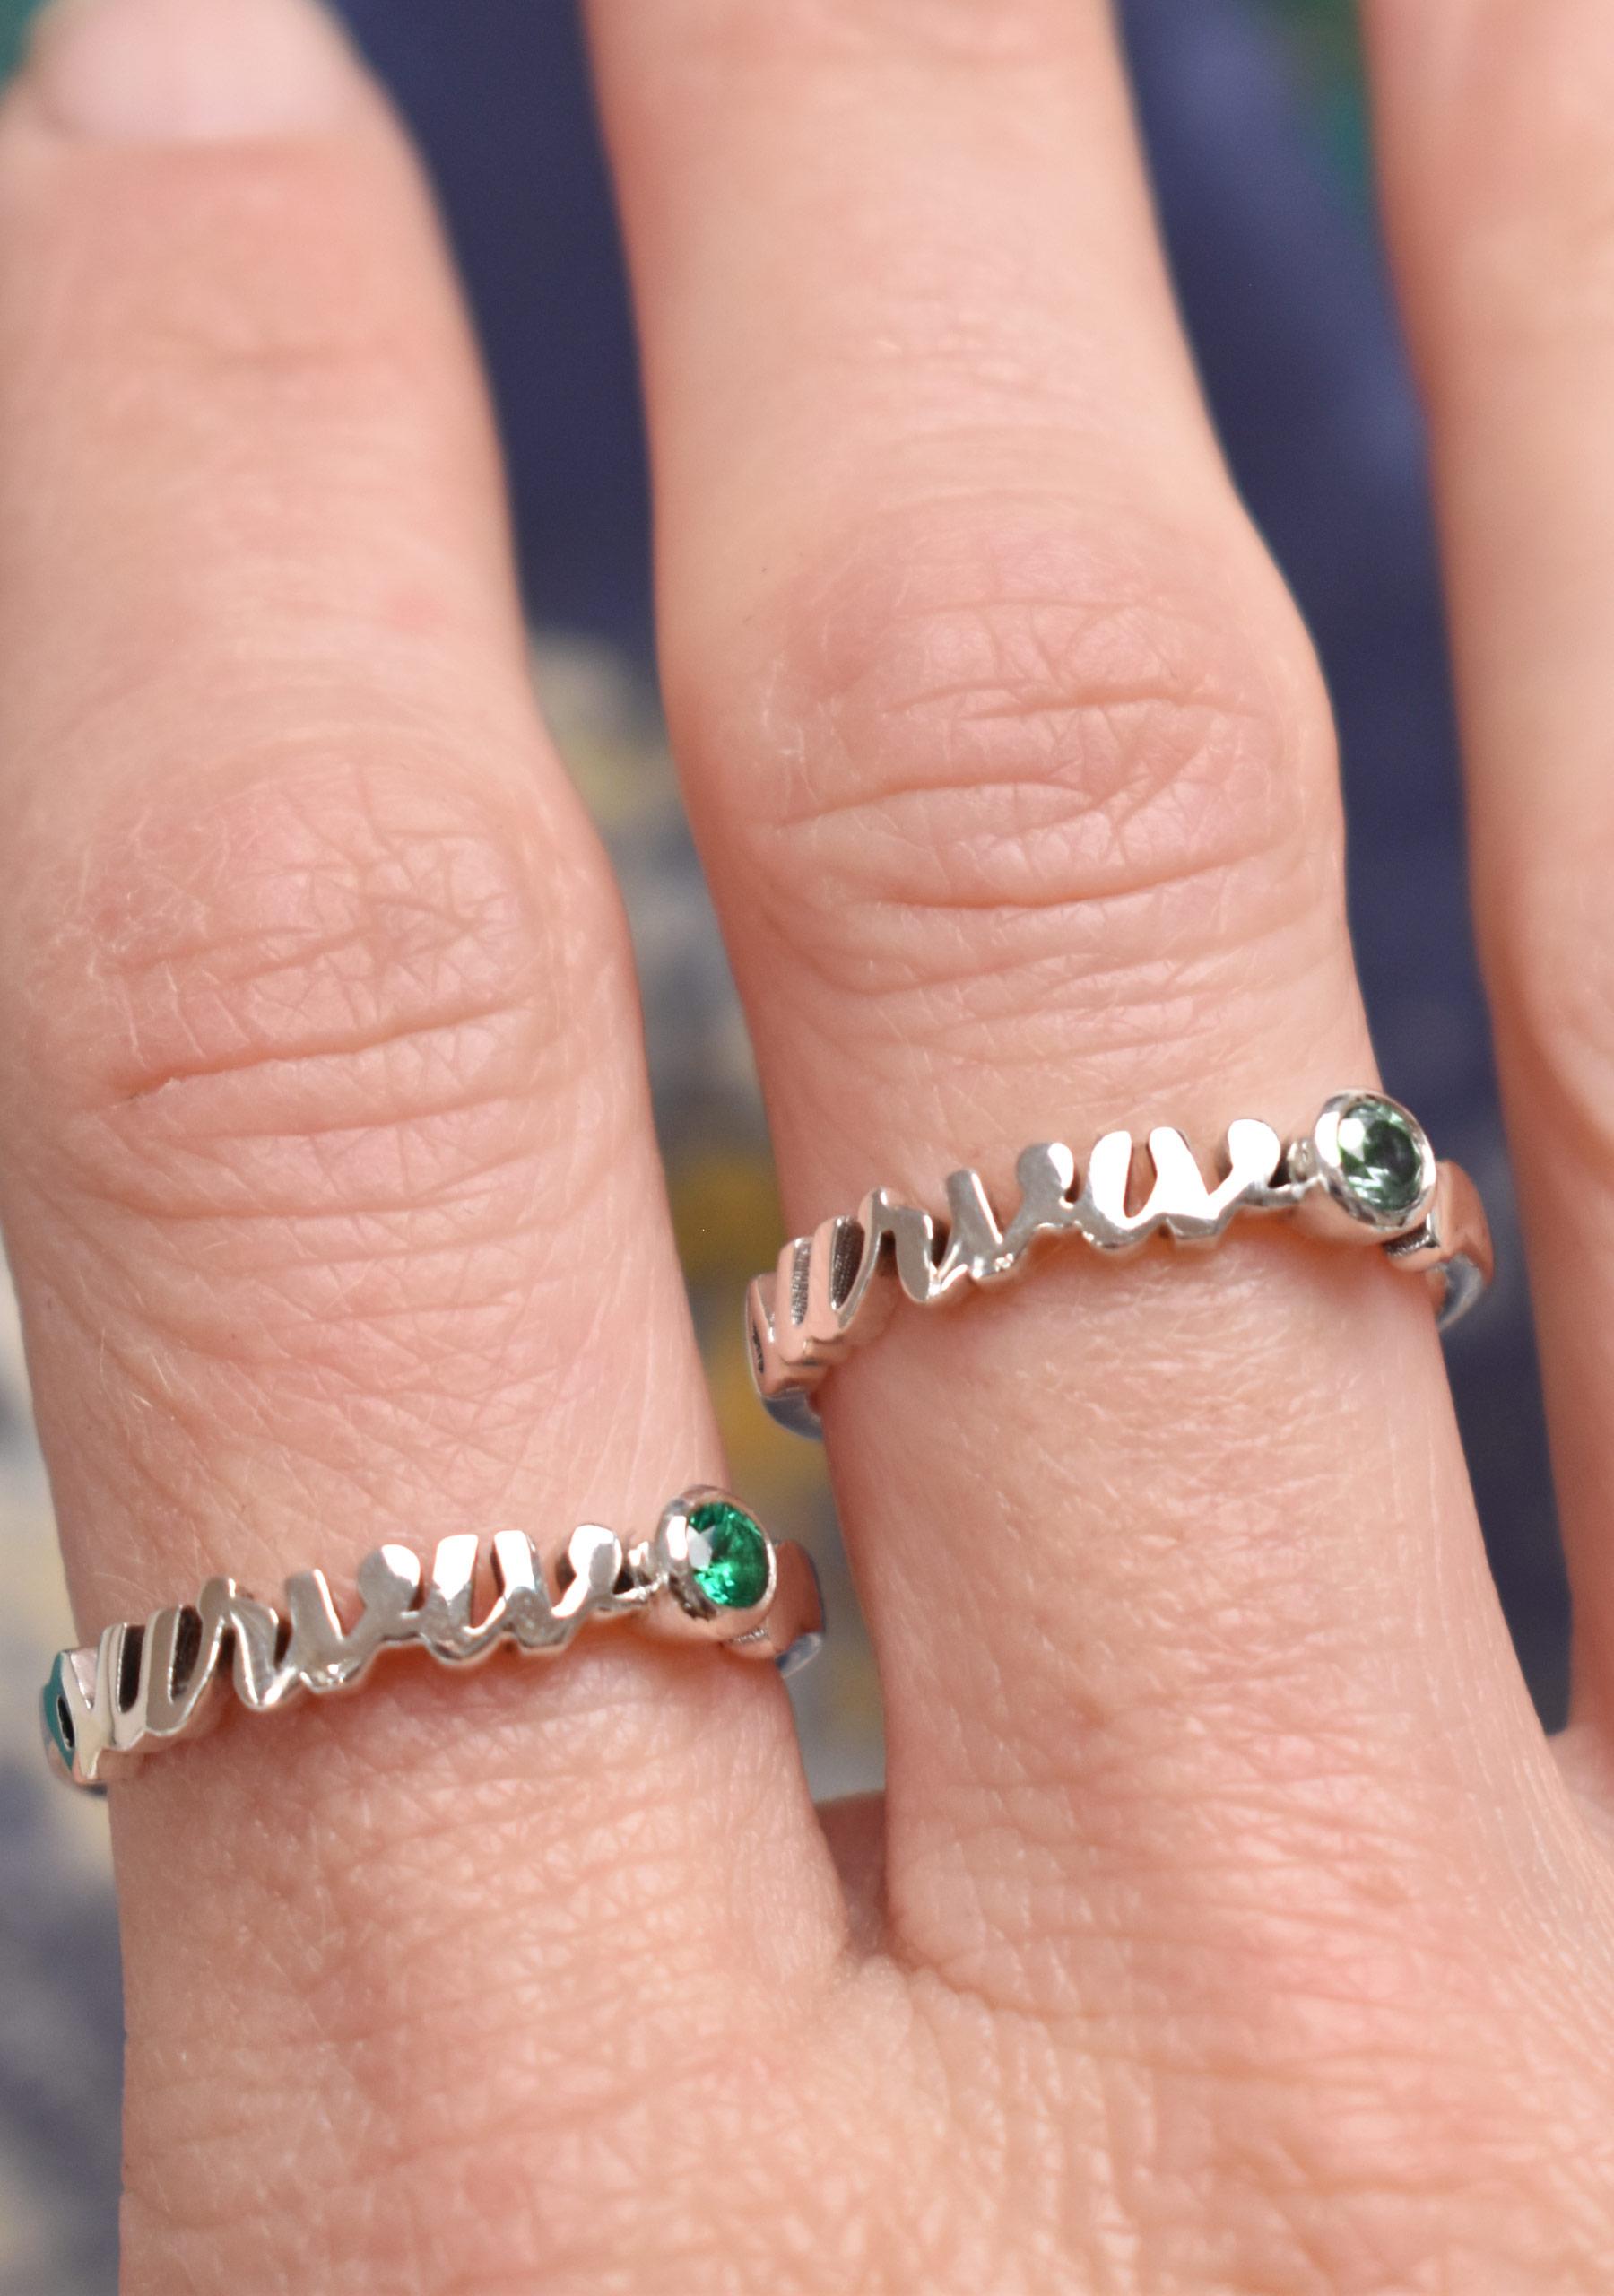 wearing Gemstone Cancer Survivor Rings